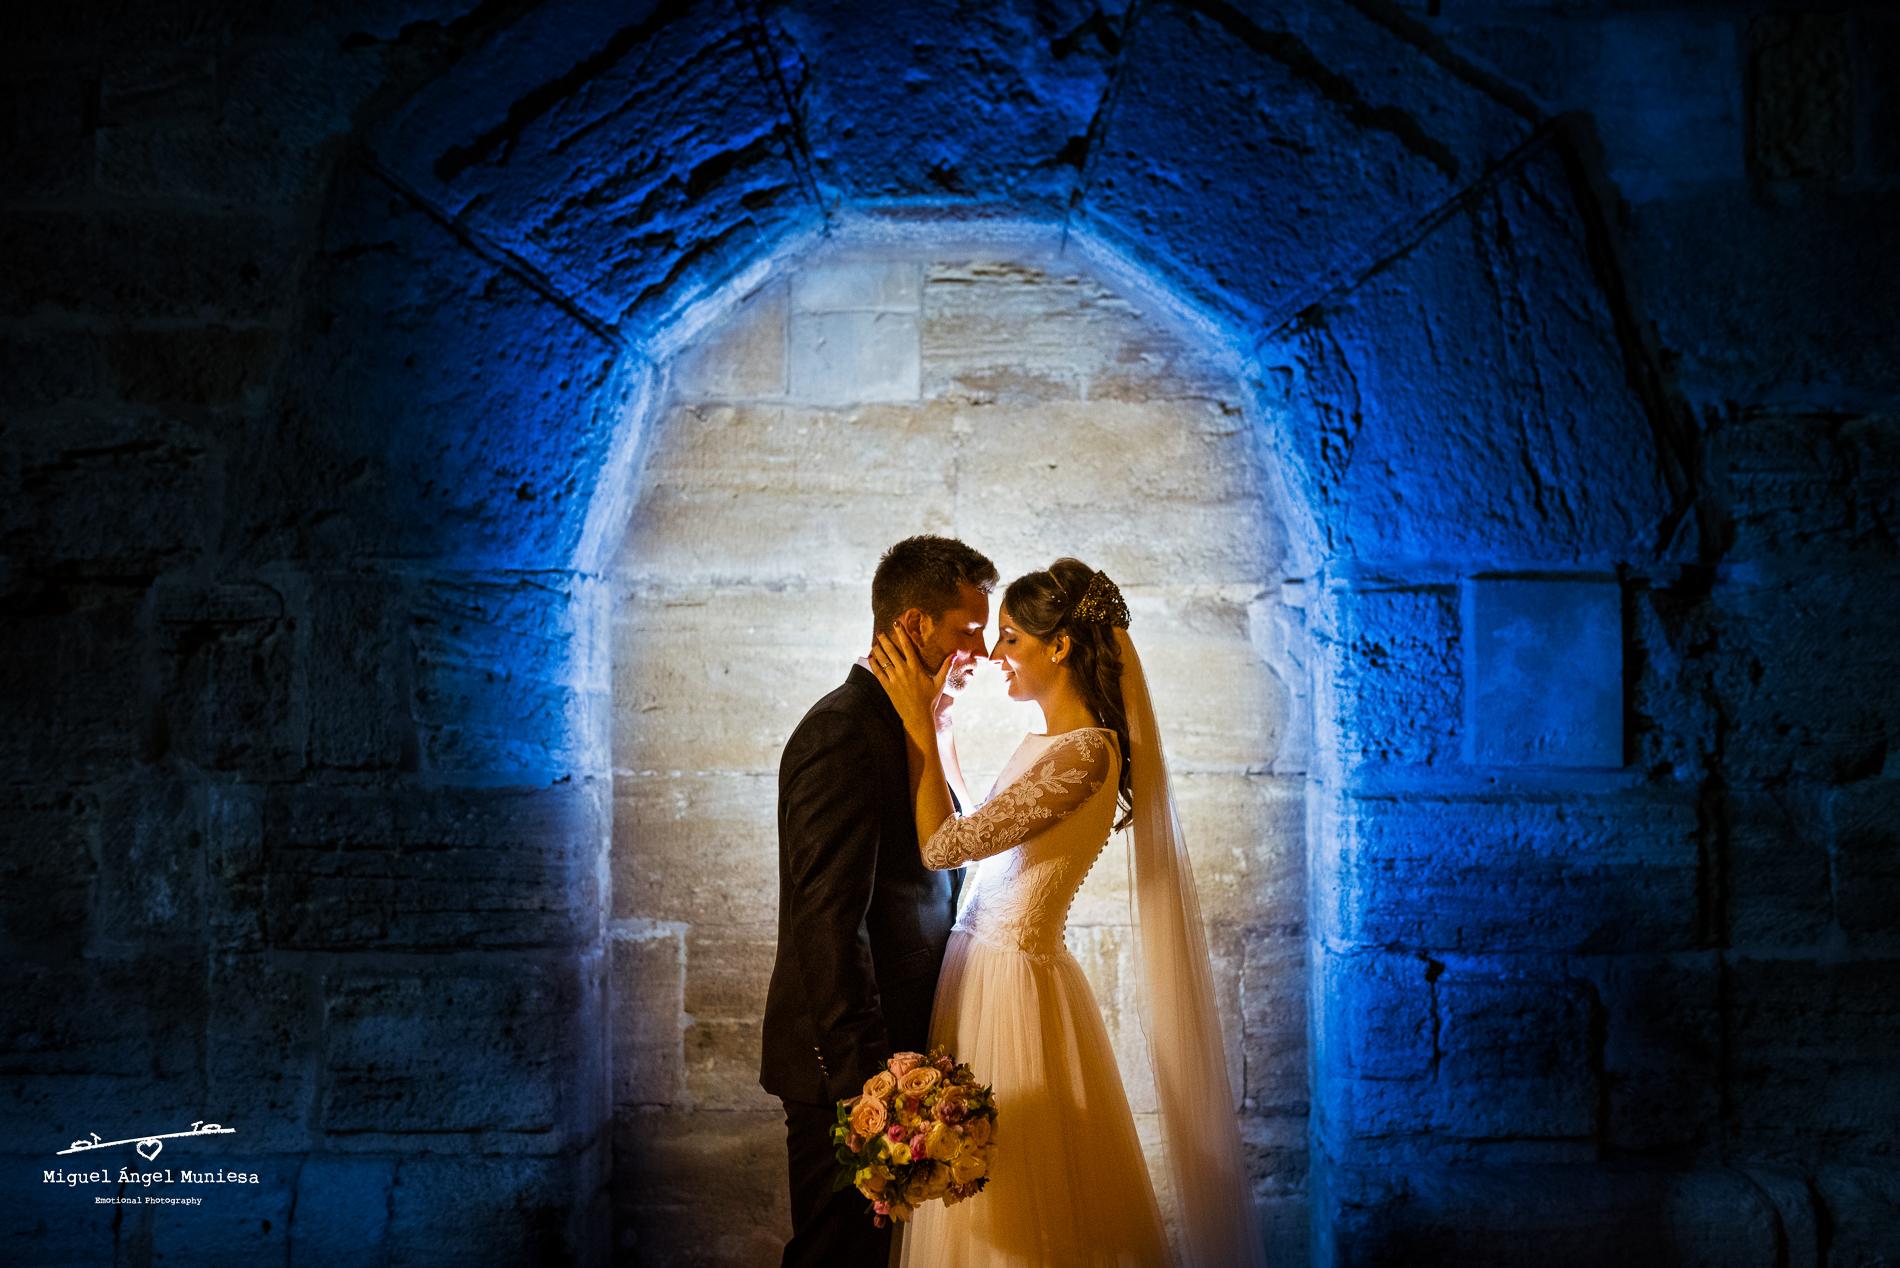 miguel angel muniesa, fotografo boda Teruel, fotografo boda navarra, fotografo boda zaragoza, fotografo boda soria, miguel angel muniesa emotional photography_17